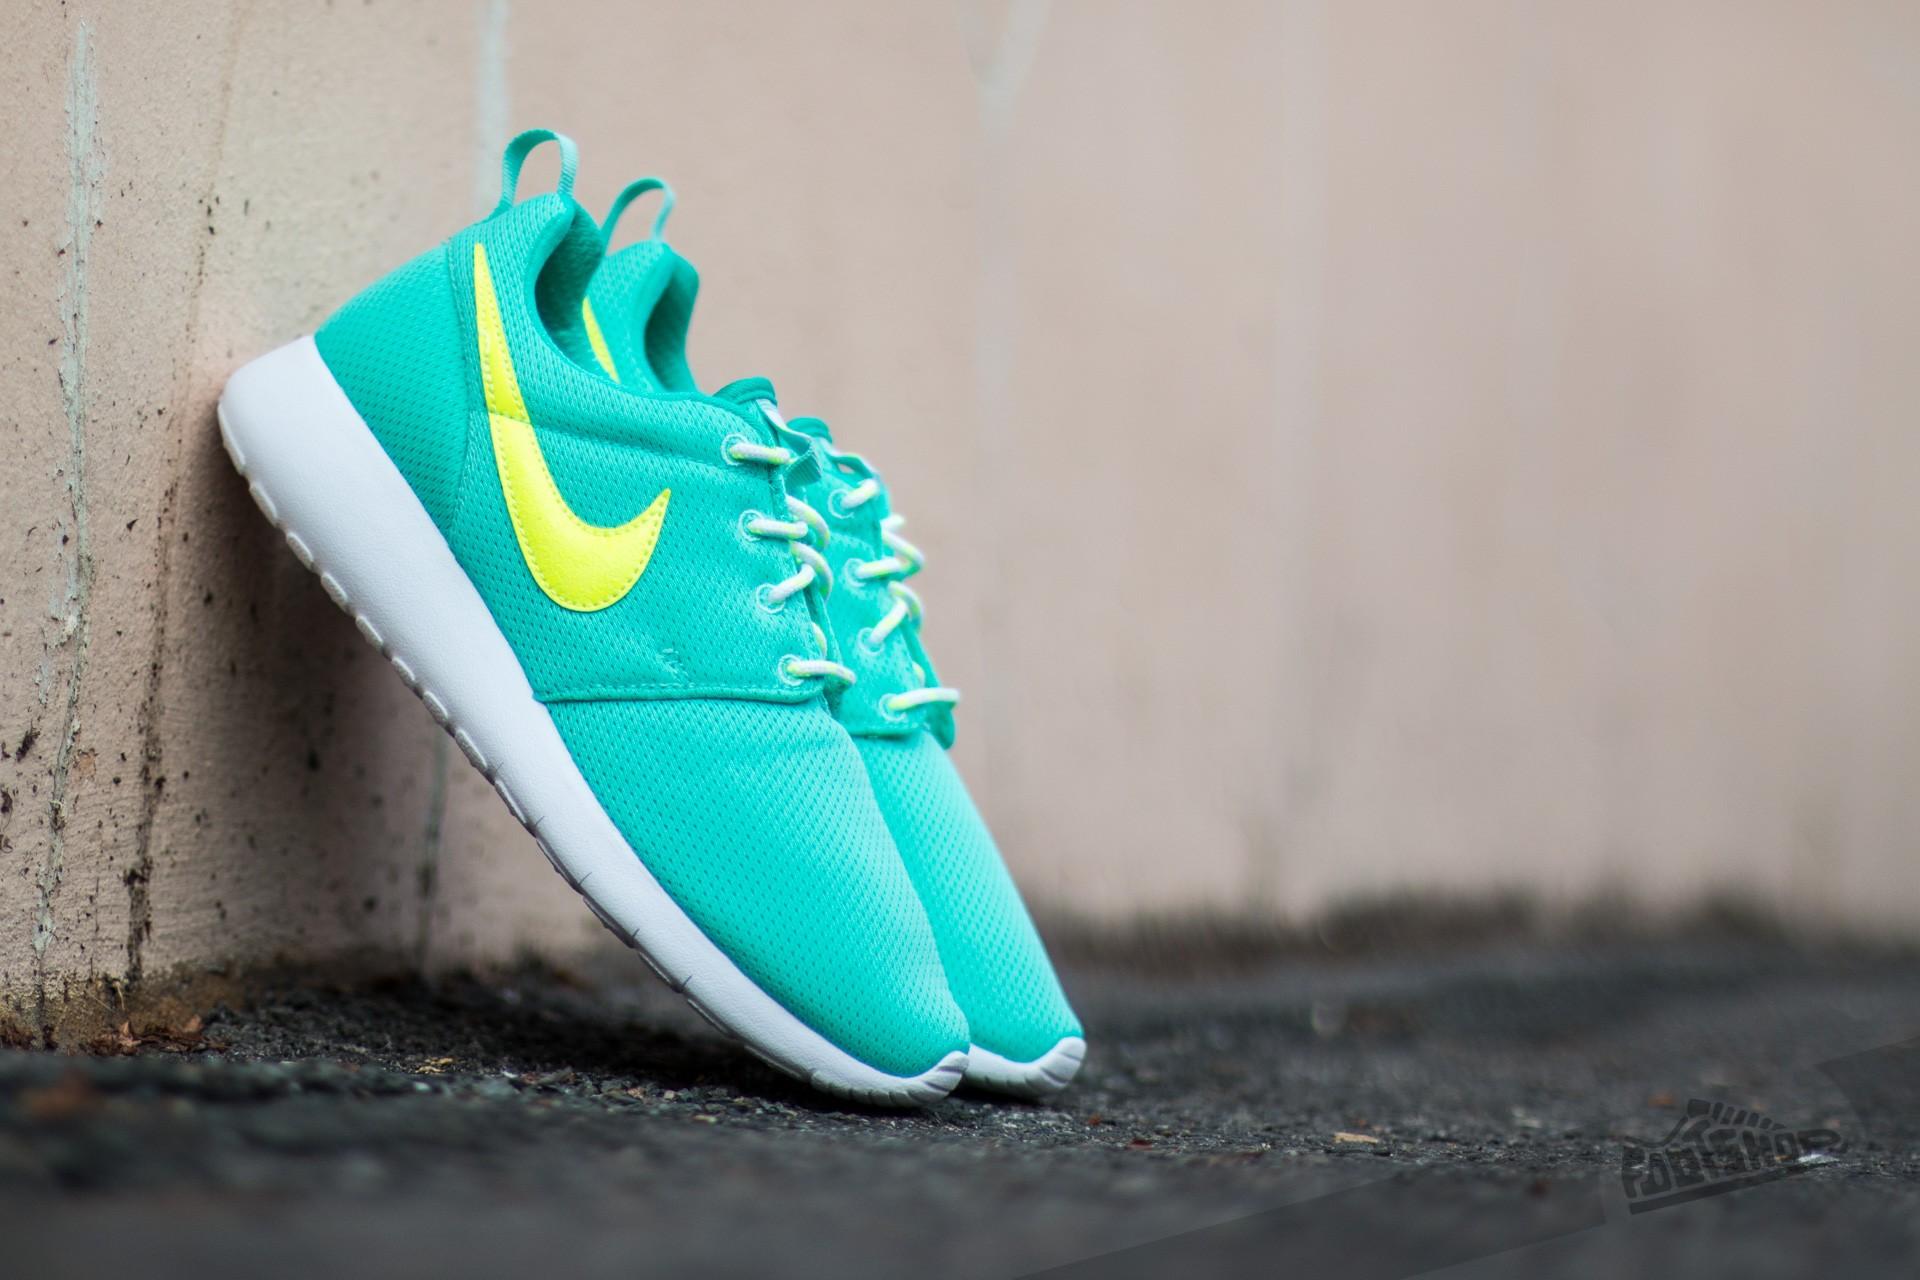 7eac8dd62b5f Nike Roshe One (GS) Hyper Turquoise  Volt-Clear Jade-White ...